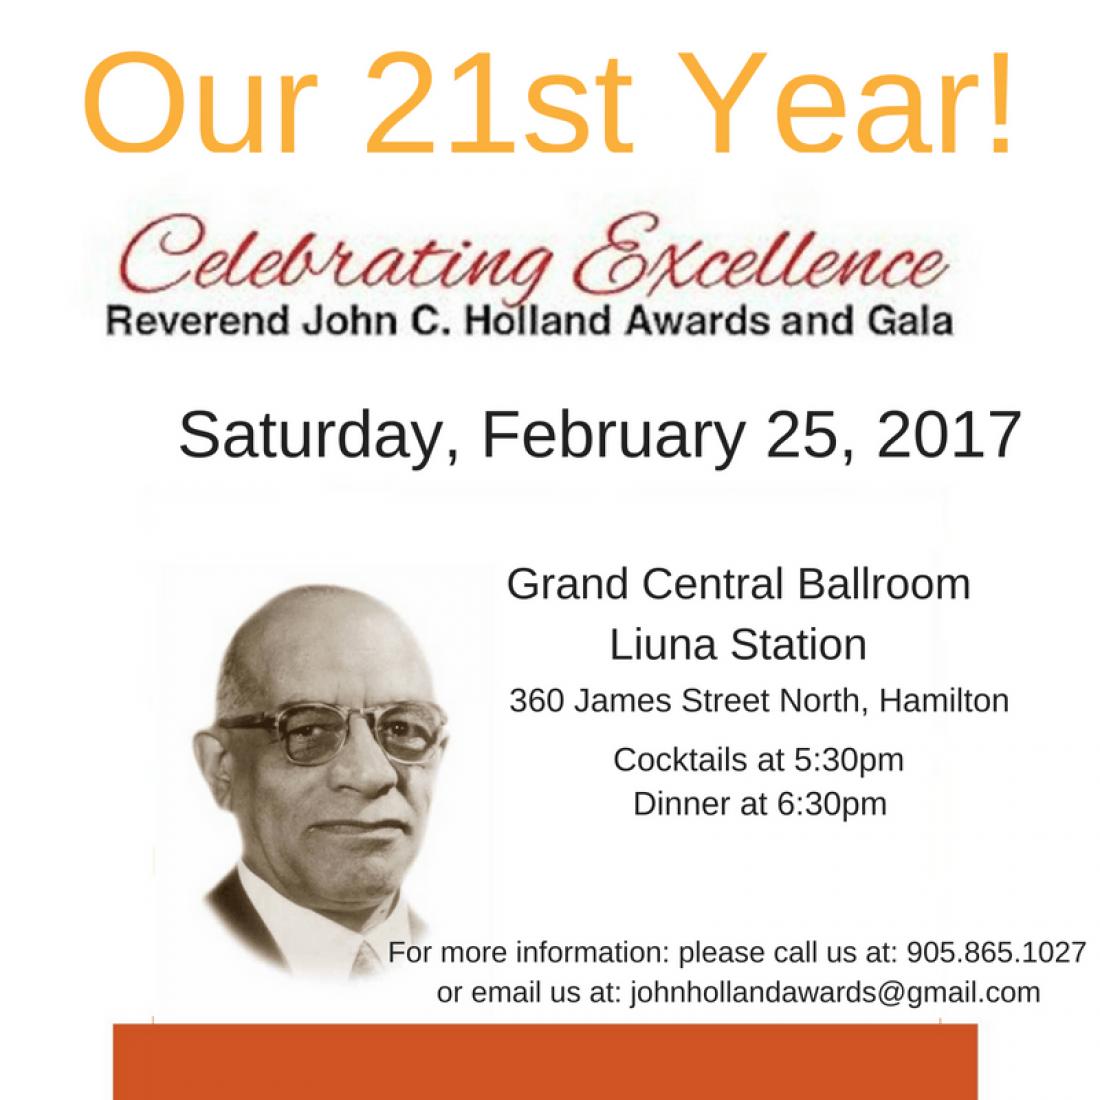 The 21st Annual Rev. John C. Holland Awards